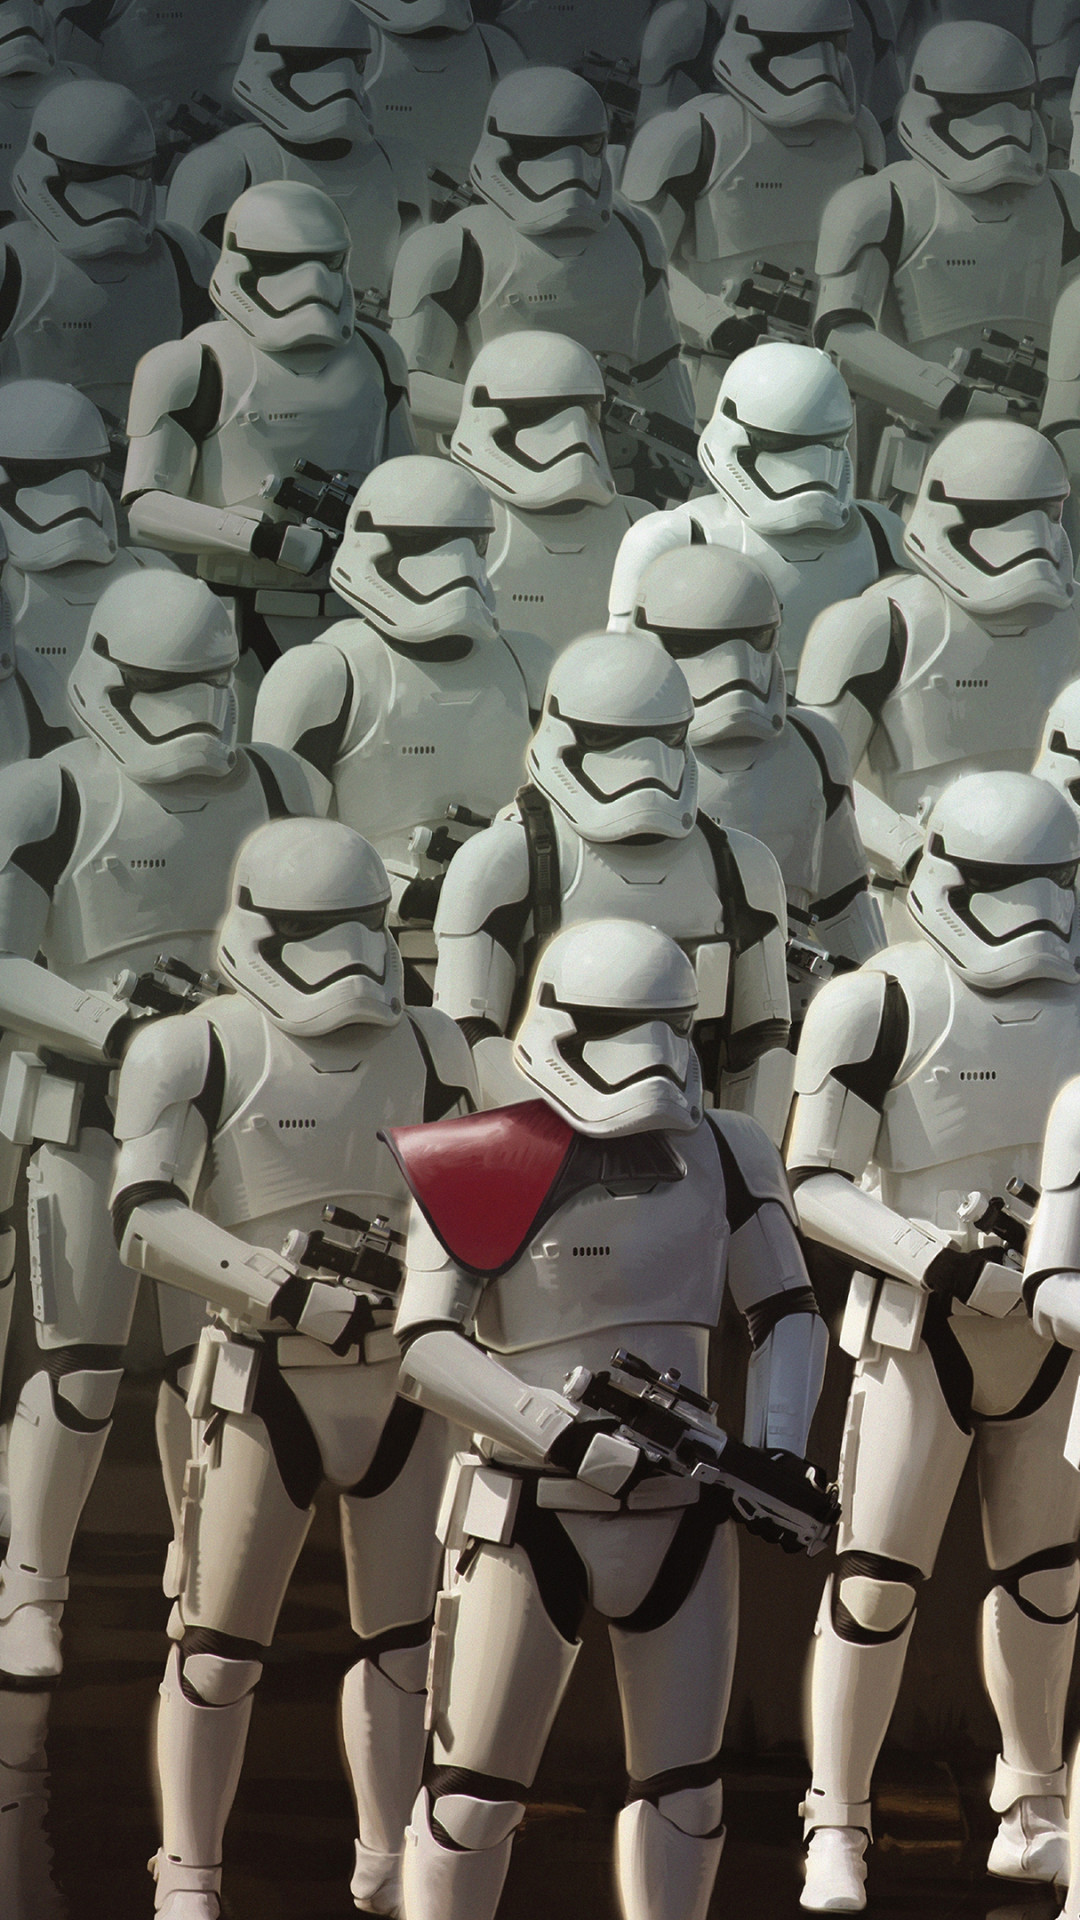 Movie Star Wars Episode VII: The Force Awakens Star Wars Stormtrooper  Mobile Wallpaper